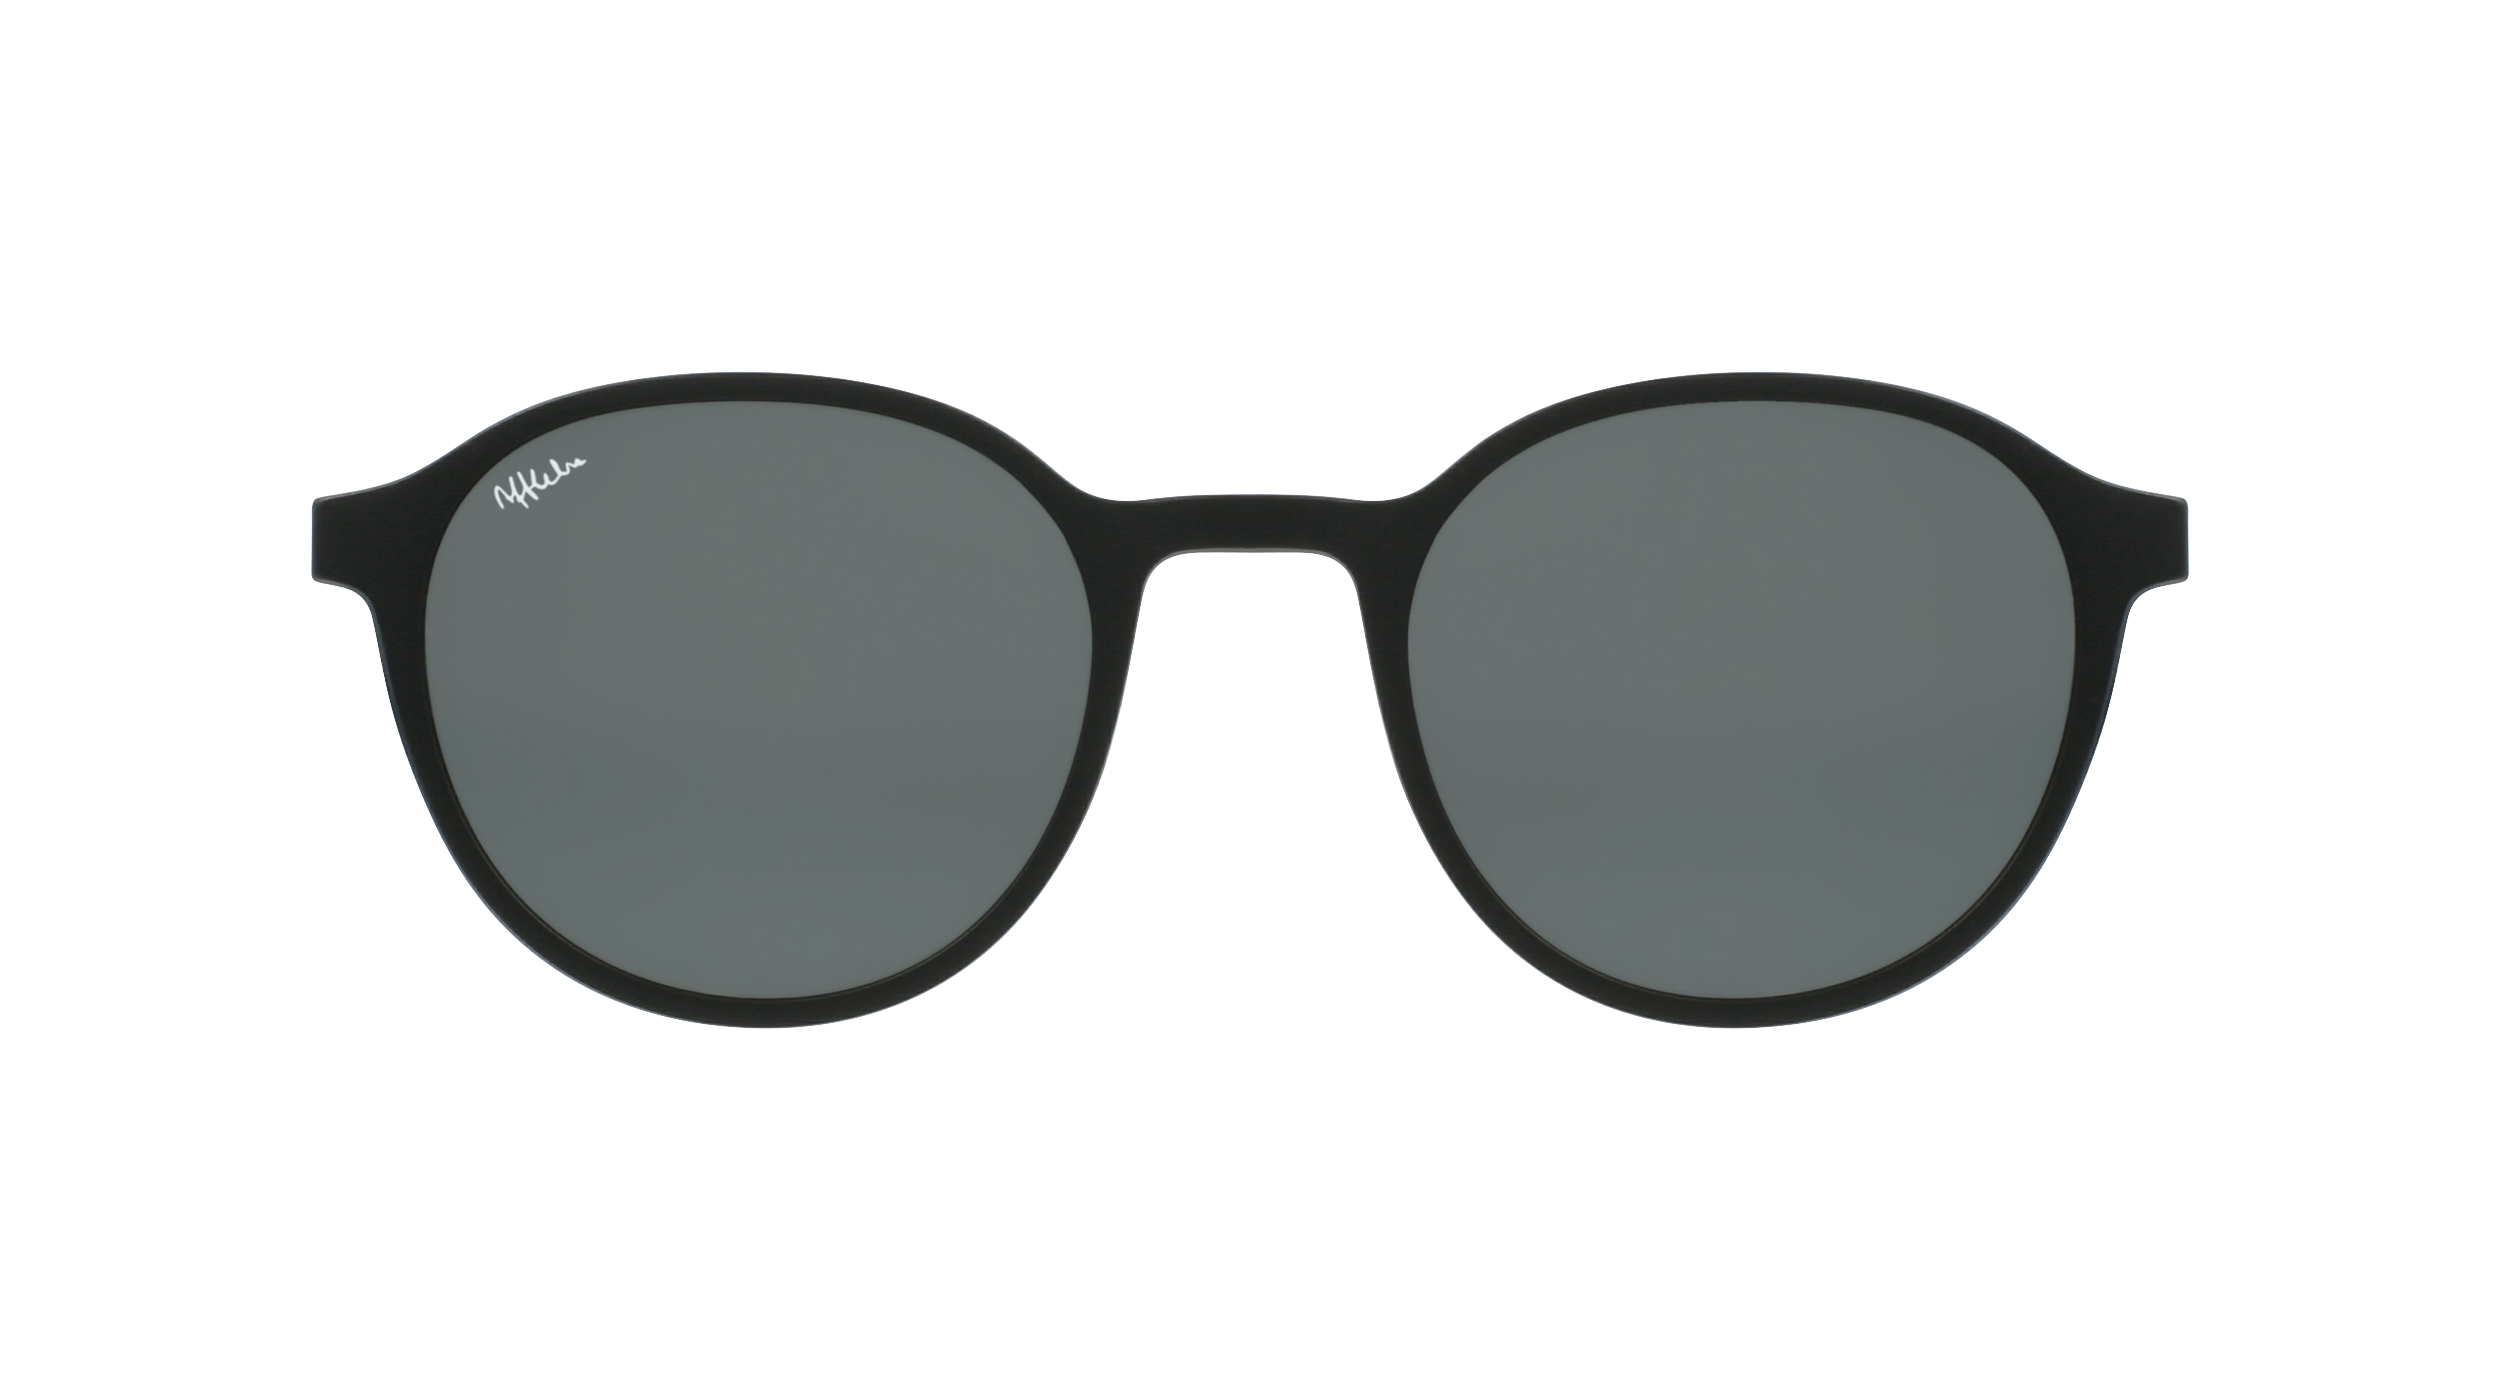 afflelou/france/products/smart_clip/clips_glasses/07630036458877.png